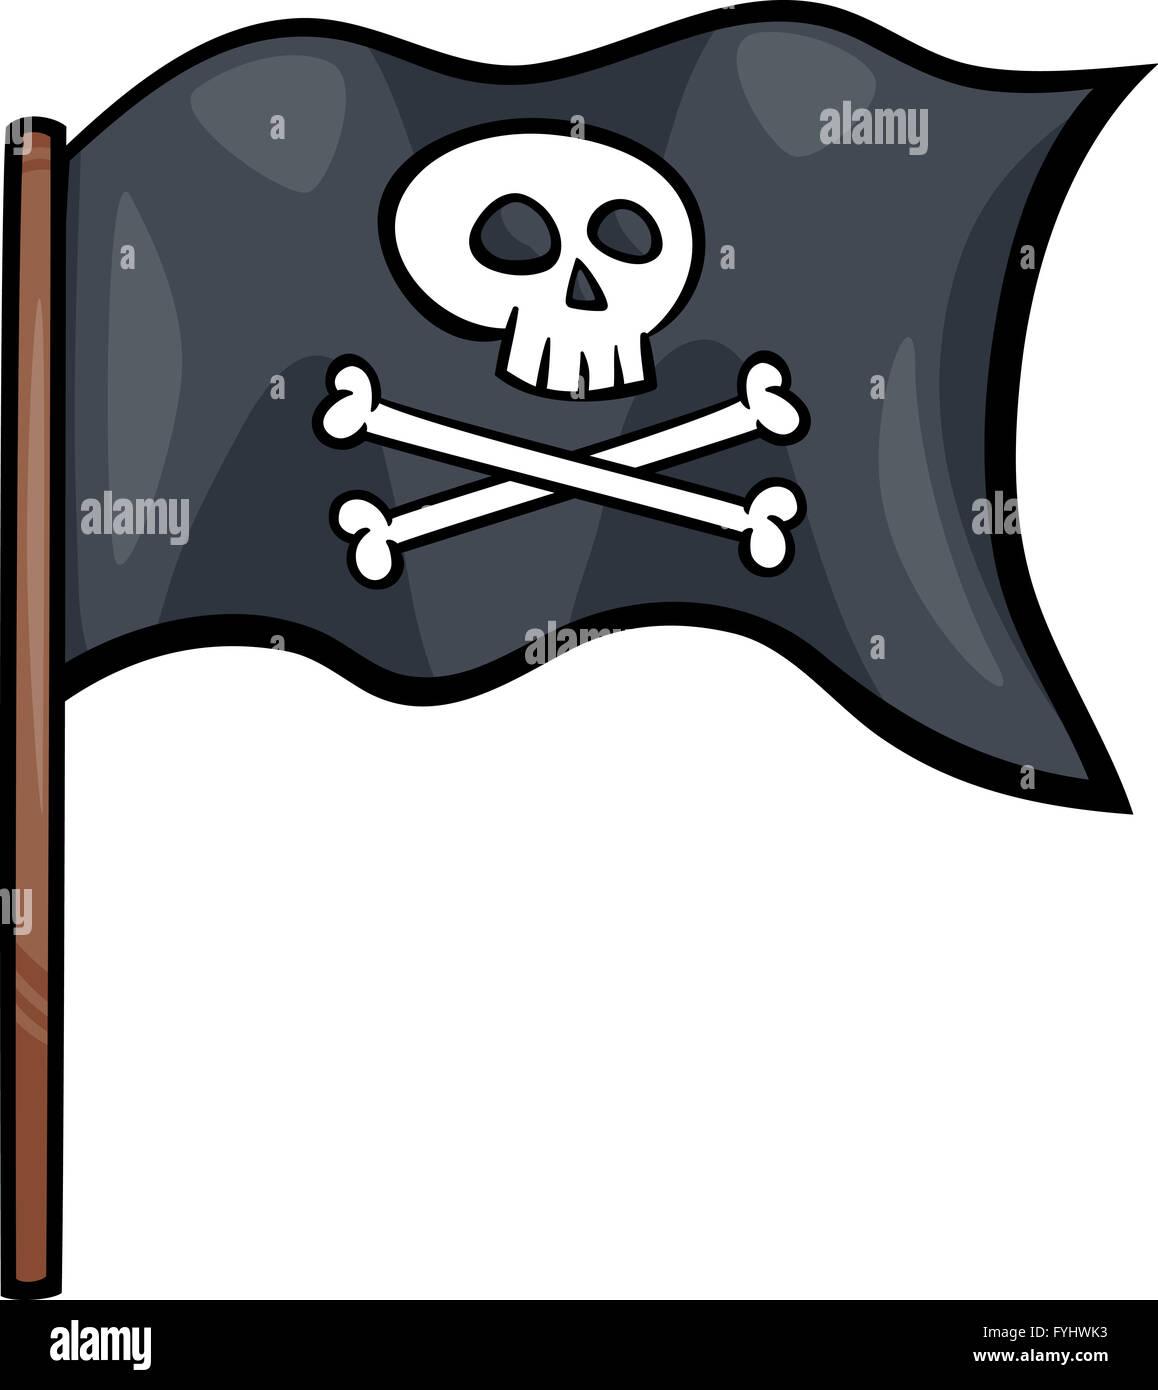 pirate flag cartoon clip art stock photo 103040871 alamy rh alamy com pirate flag clip art black and white Pirate Hat Clip Art